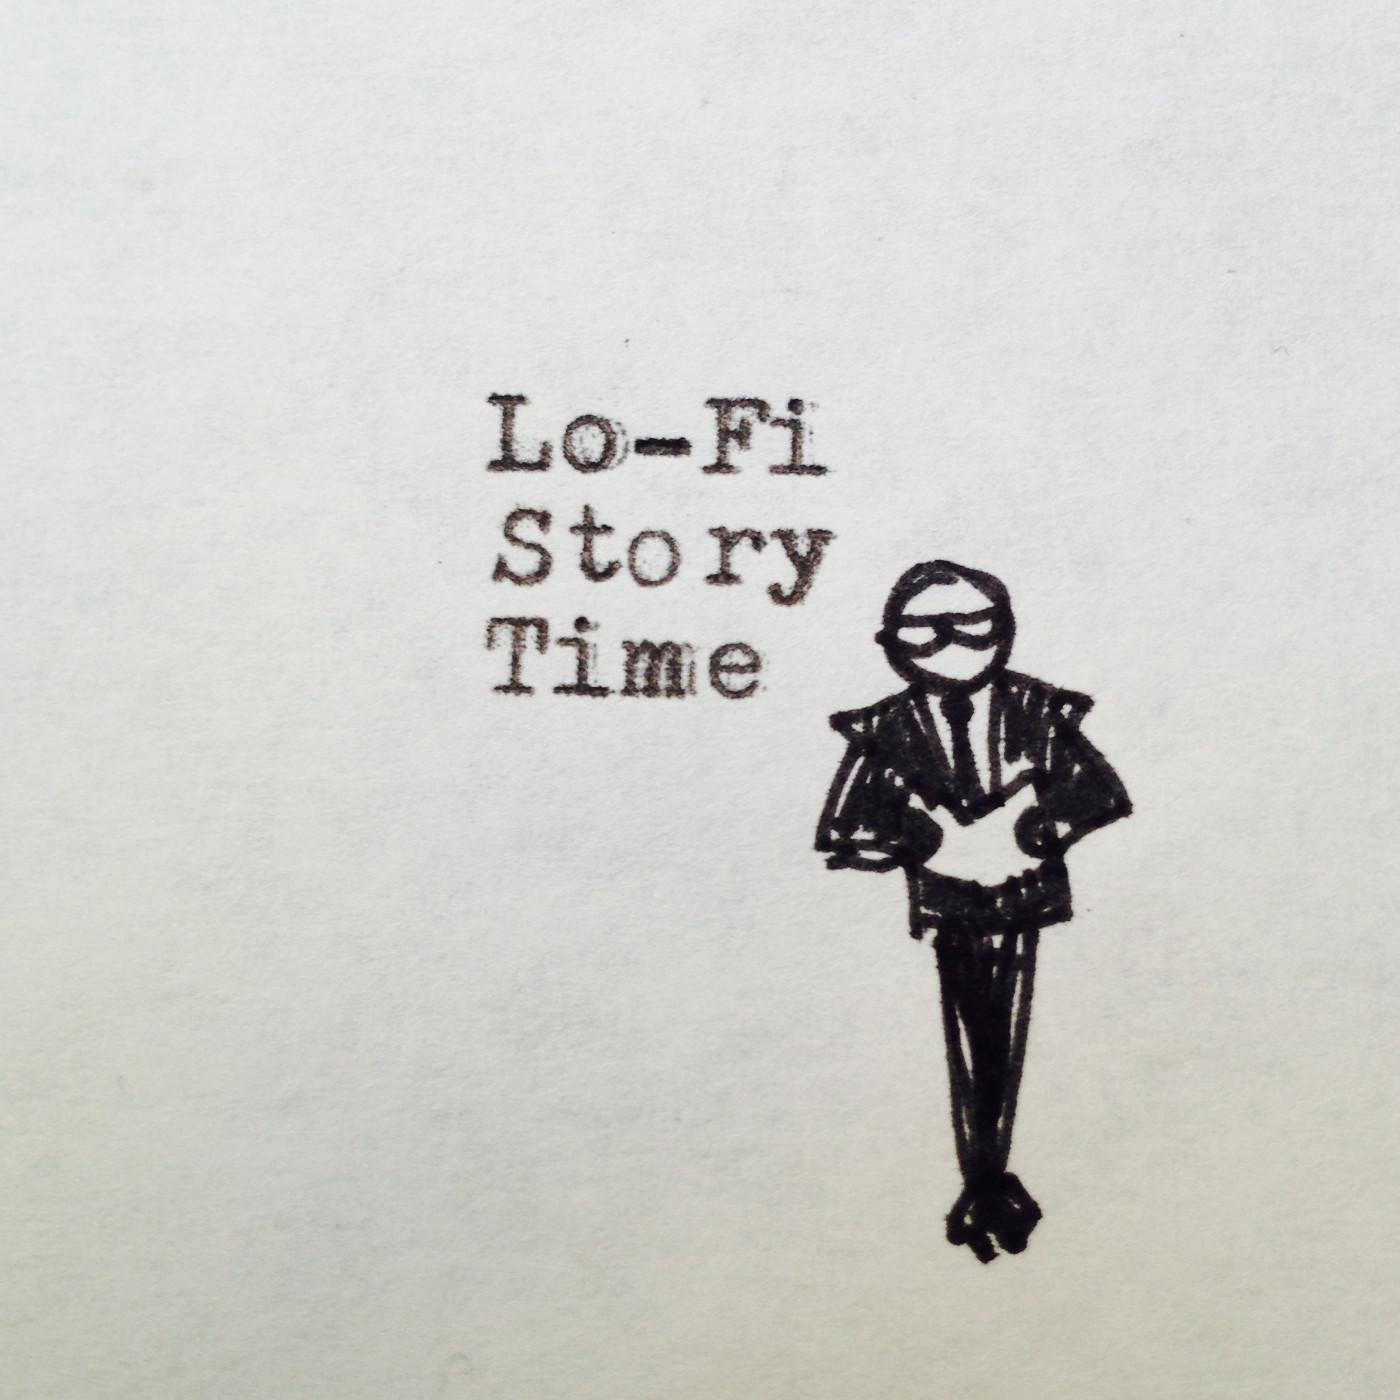 Lo-Fi Story Time